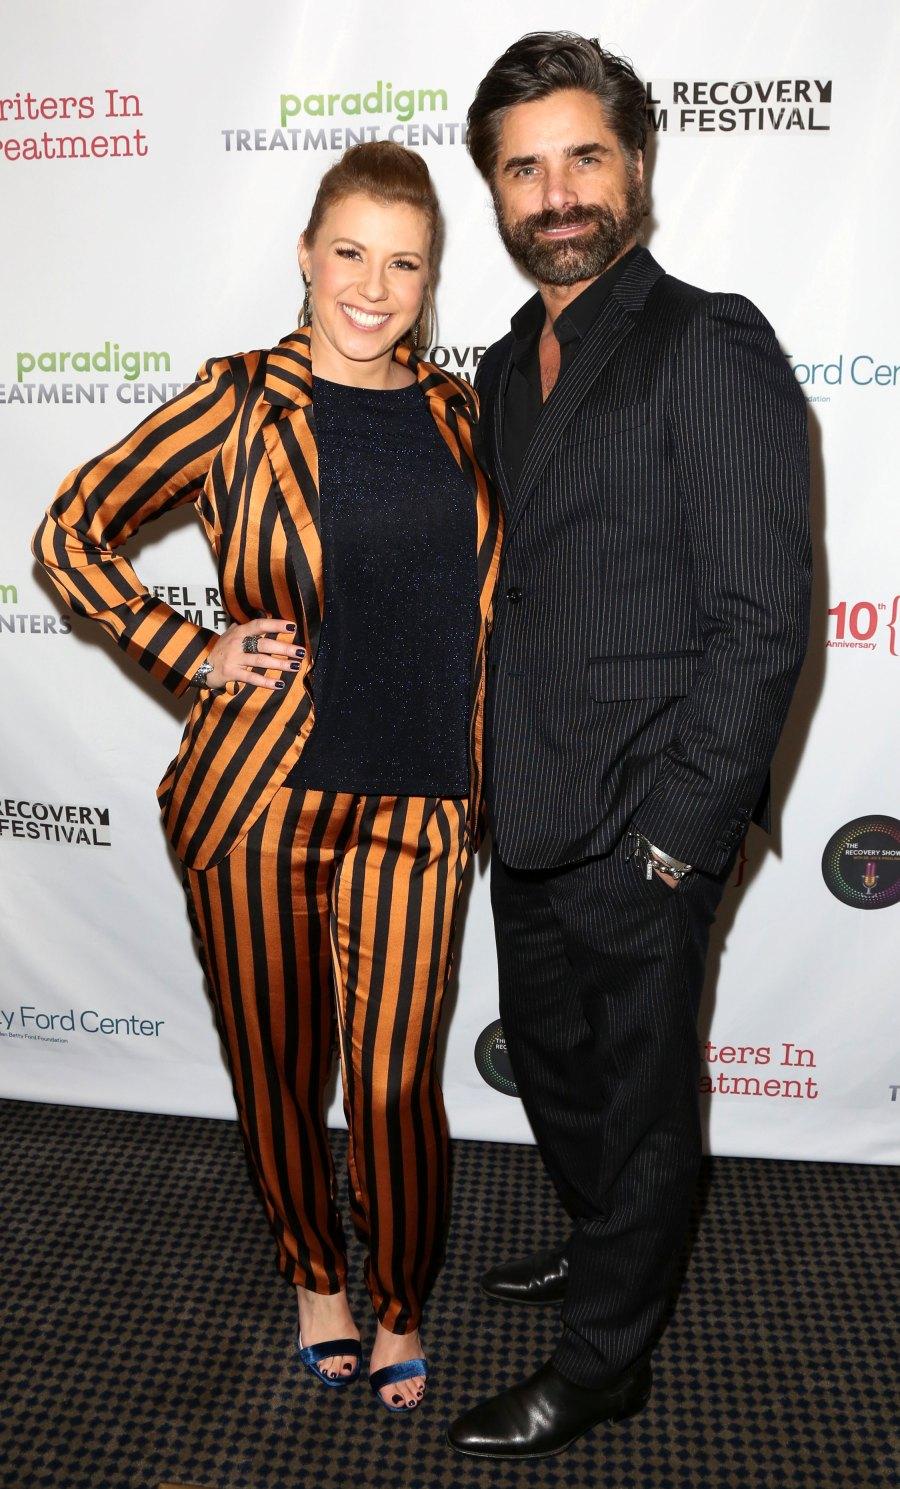 Full House's John Stamos and Jodie Sweetin